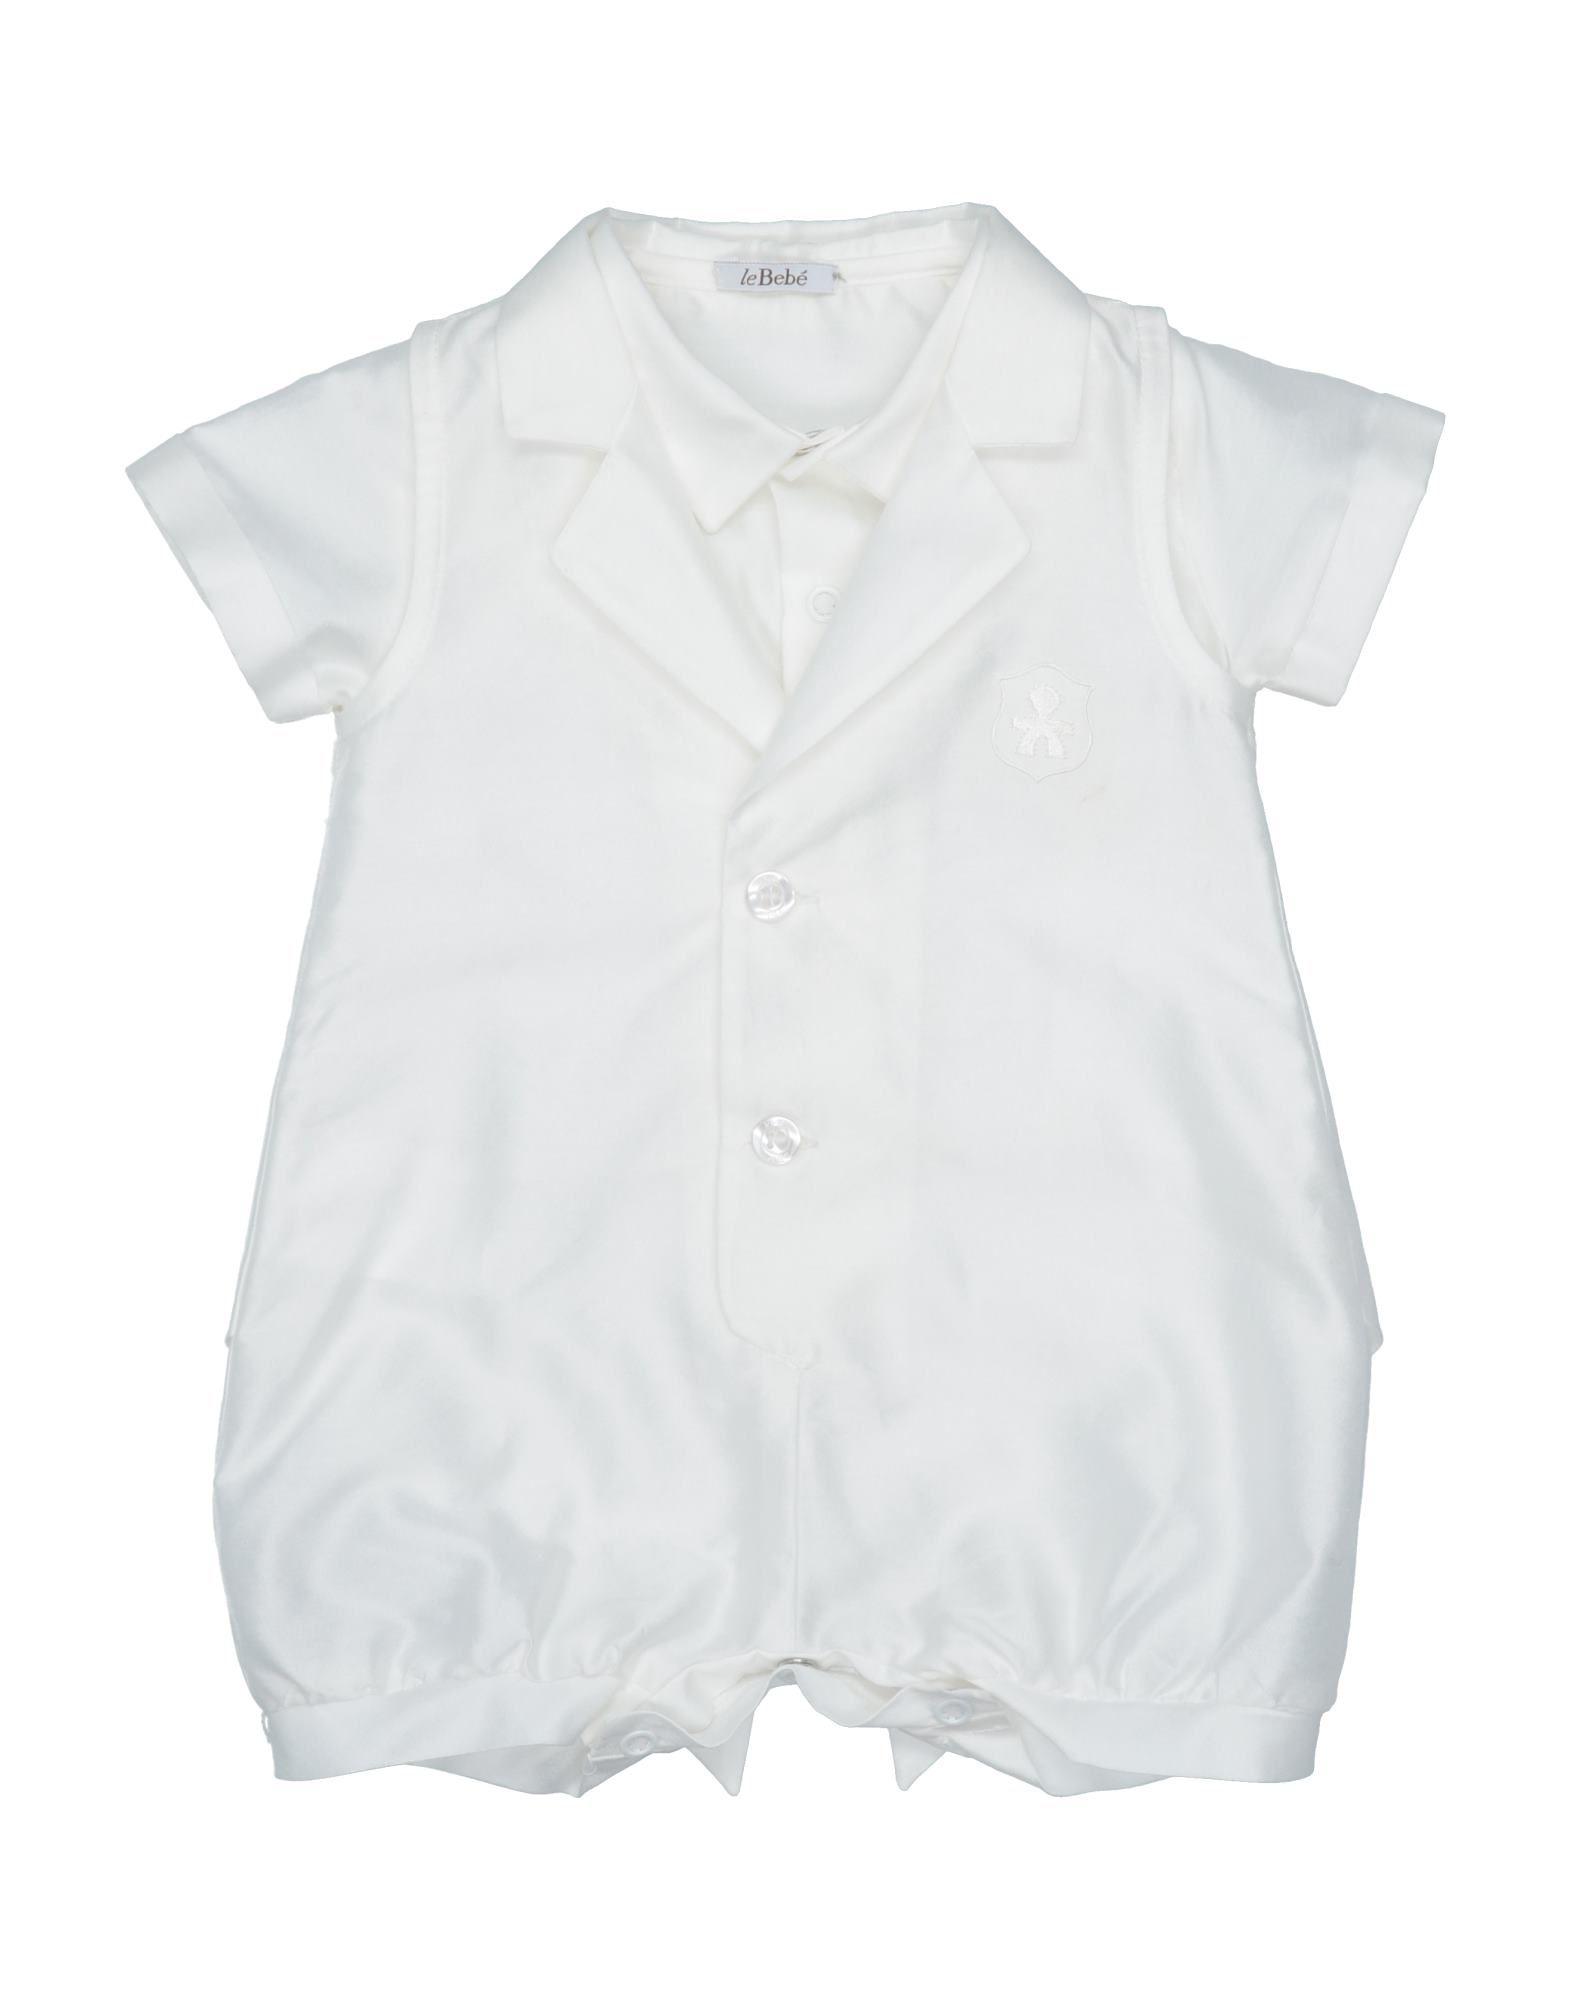 YOOX.COM(ユークス)《セール開催中》LE BEB? ボーイズ 0-24 ヶ月 乳幼児用ロンパース ホワイト 6 コットン 90% / ポリエステル 10%